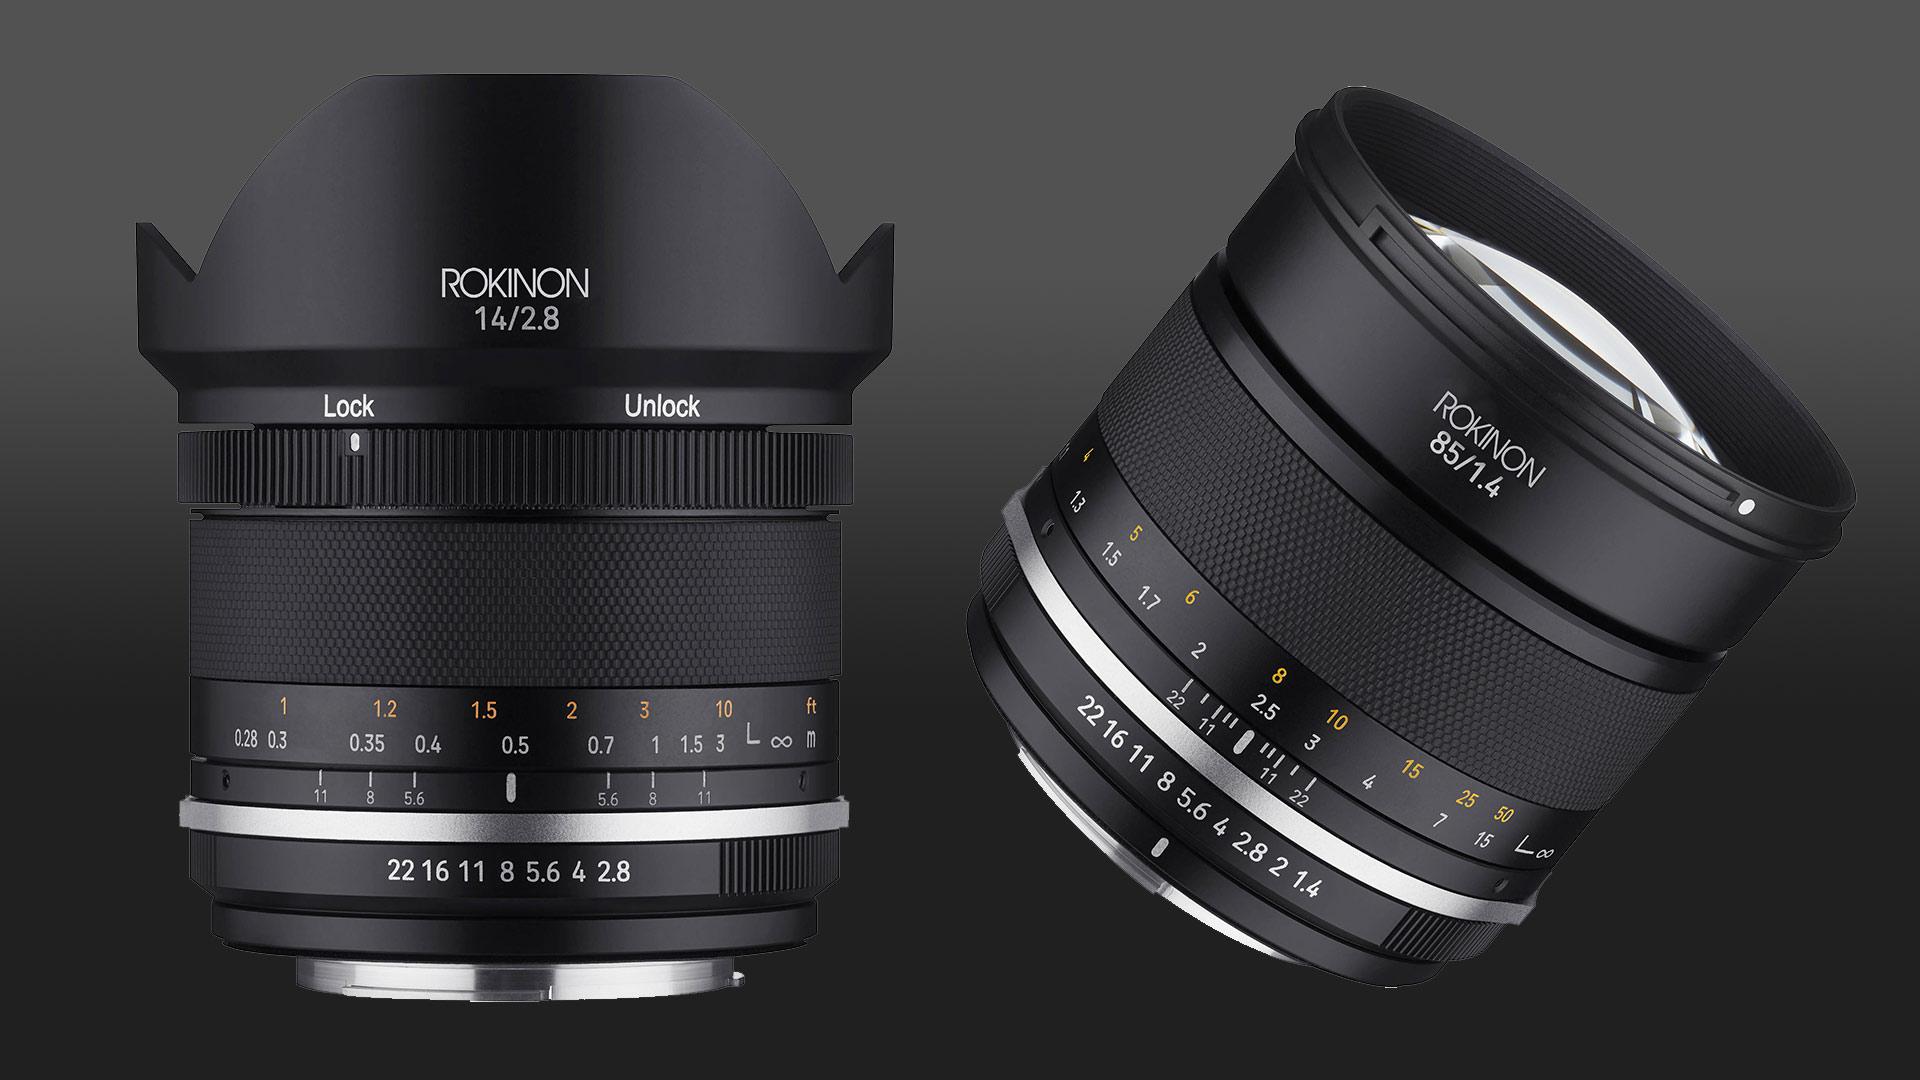 Samyang Serie II - Nuevos lentes manuales 14 mm f/2.8 y 85 mm f/1.4